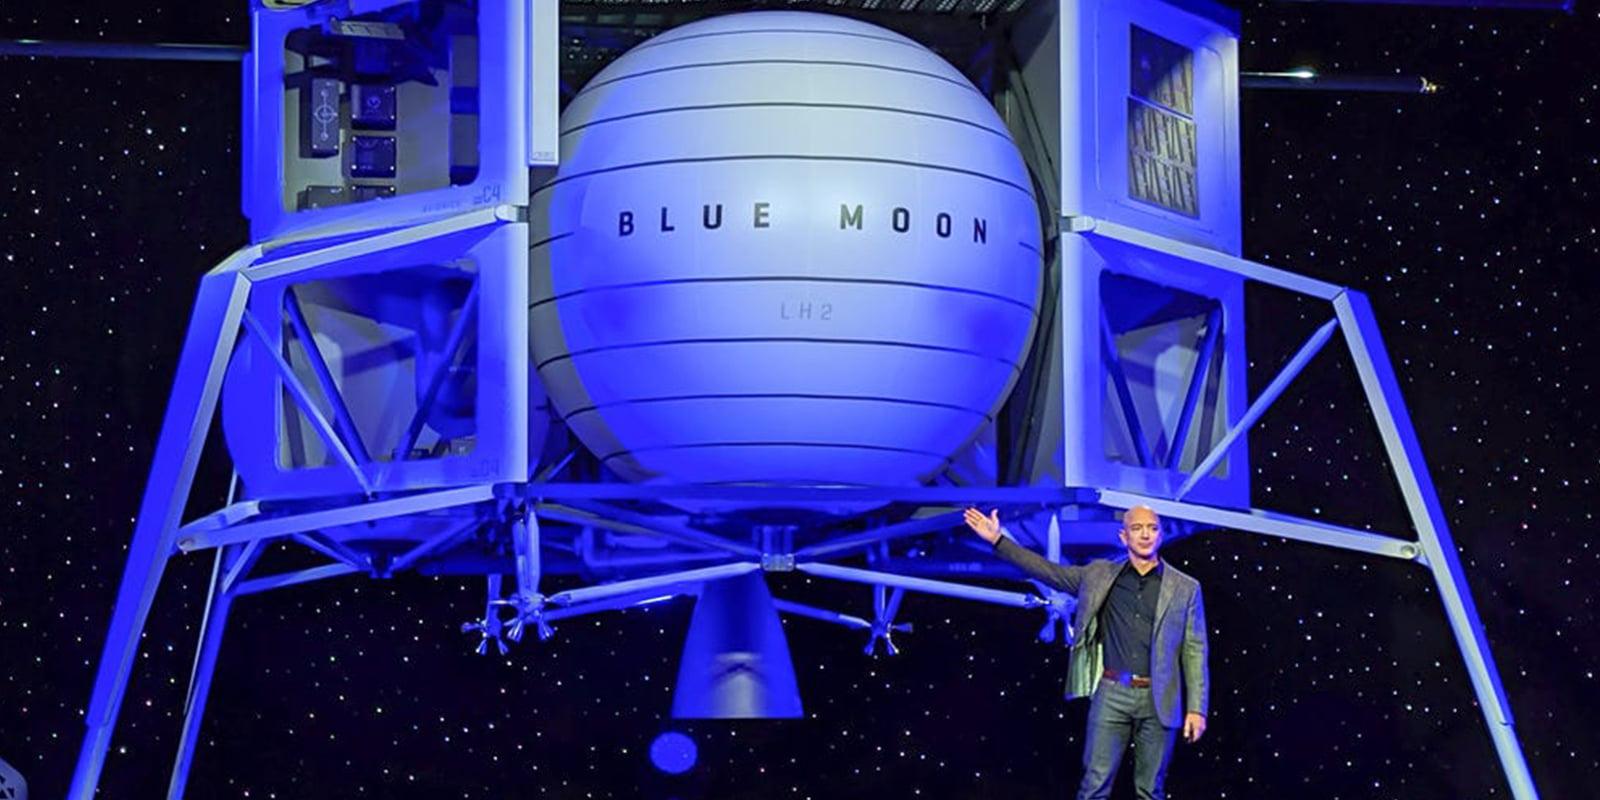 Jeff Bezos offers NASA $2 billion for lunar landing contract